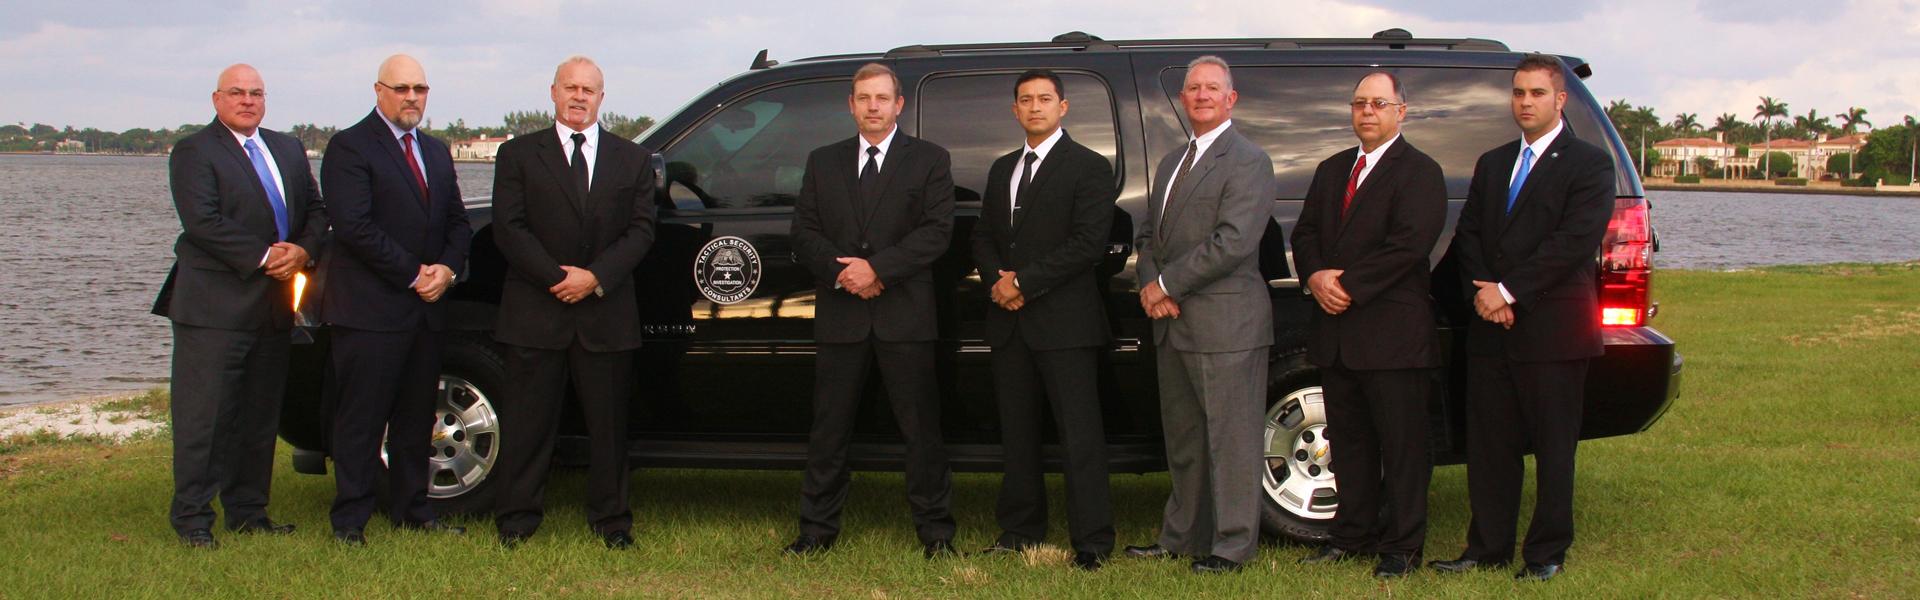 Team Executive Protection